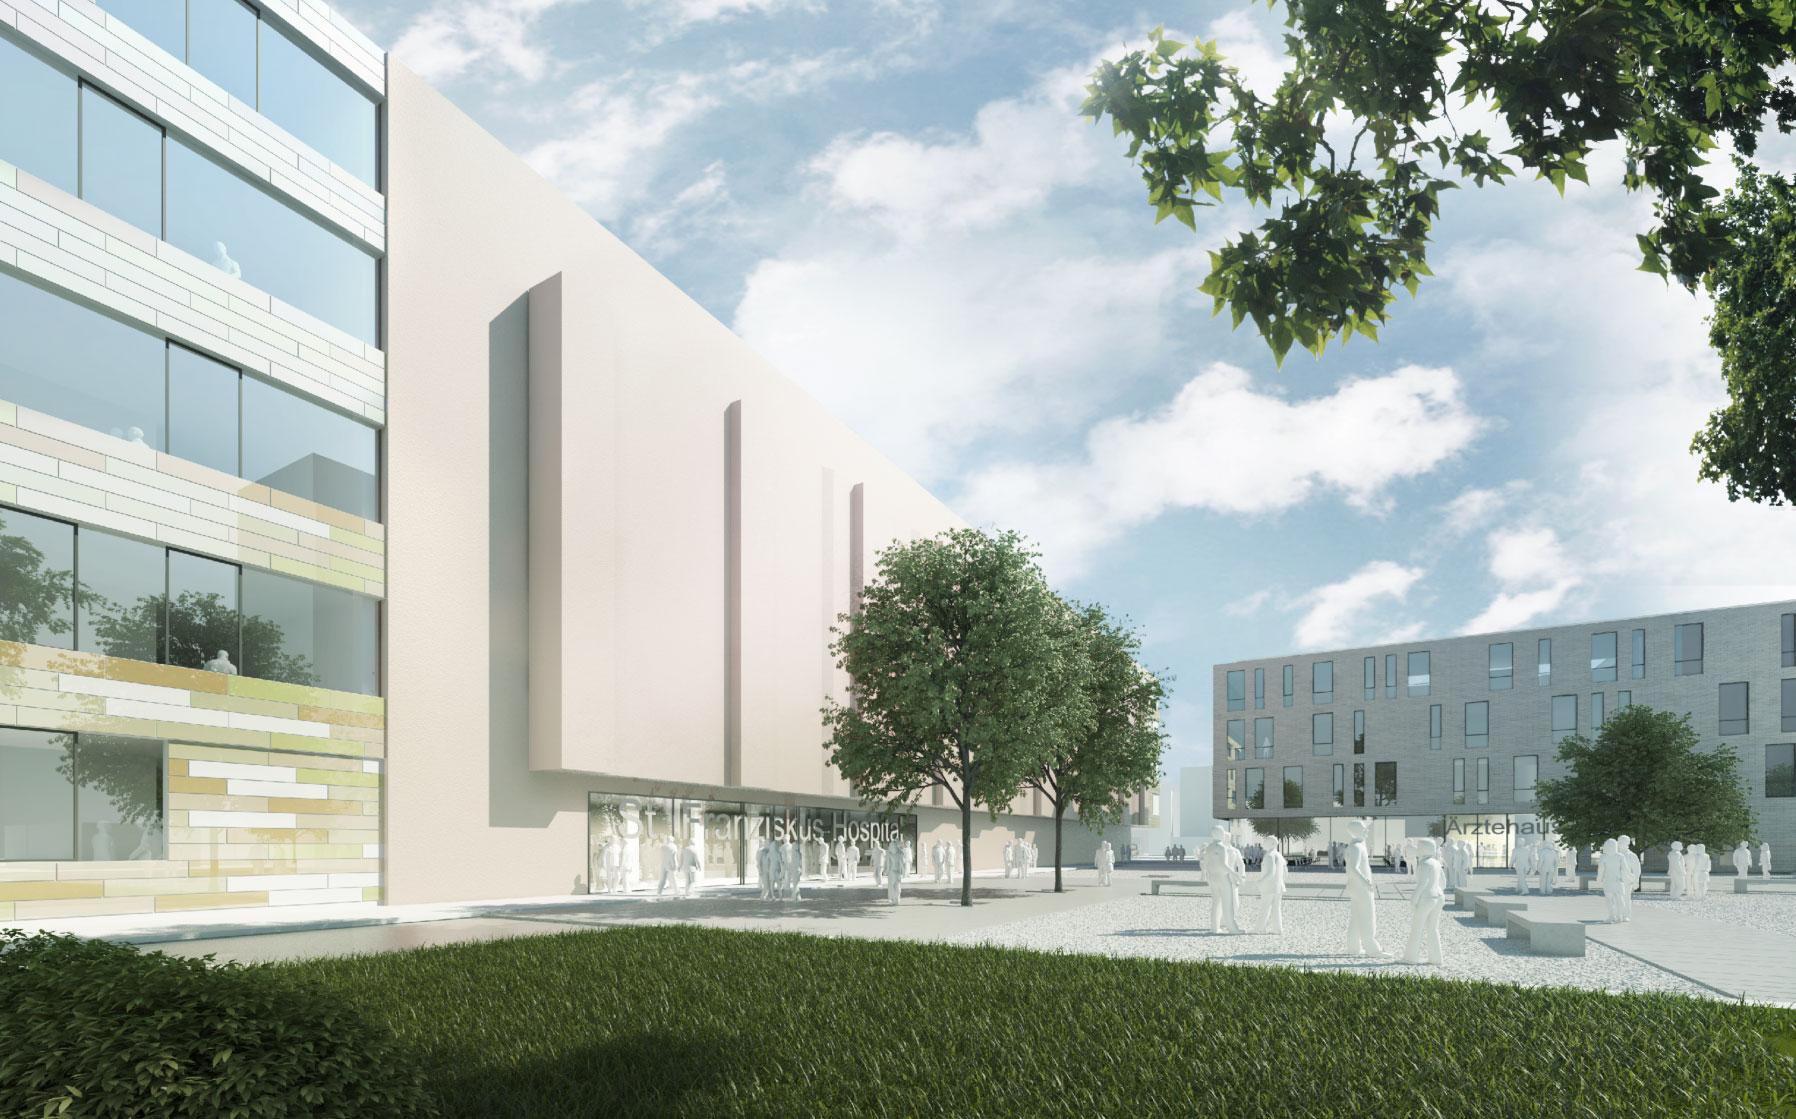 Ergebnis St Franziskus Hospital In Köln Ehrenfeldcompetitionline